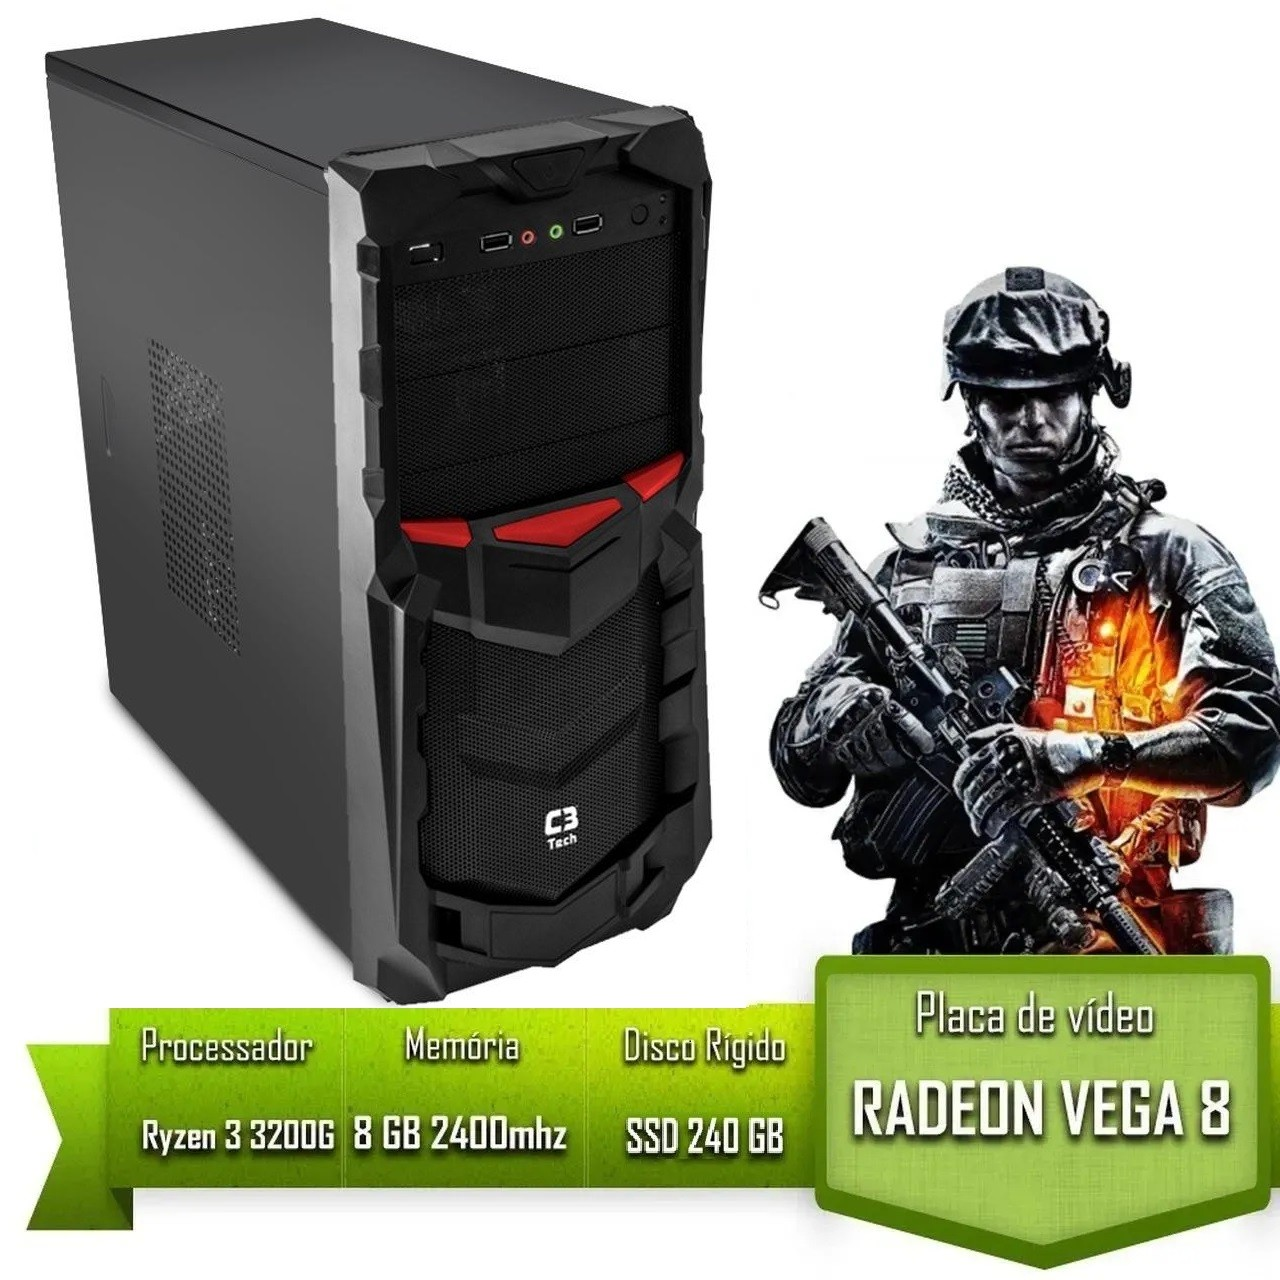 Pc Gamer Alligator Gaming AMD Ryzen 3 3200G / 8GB 2400MHZ /SSD 240GB / VEGA 8